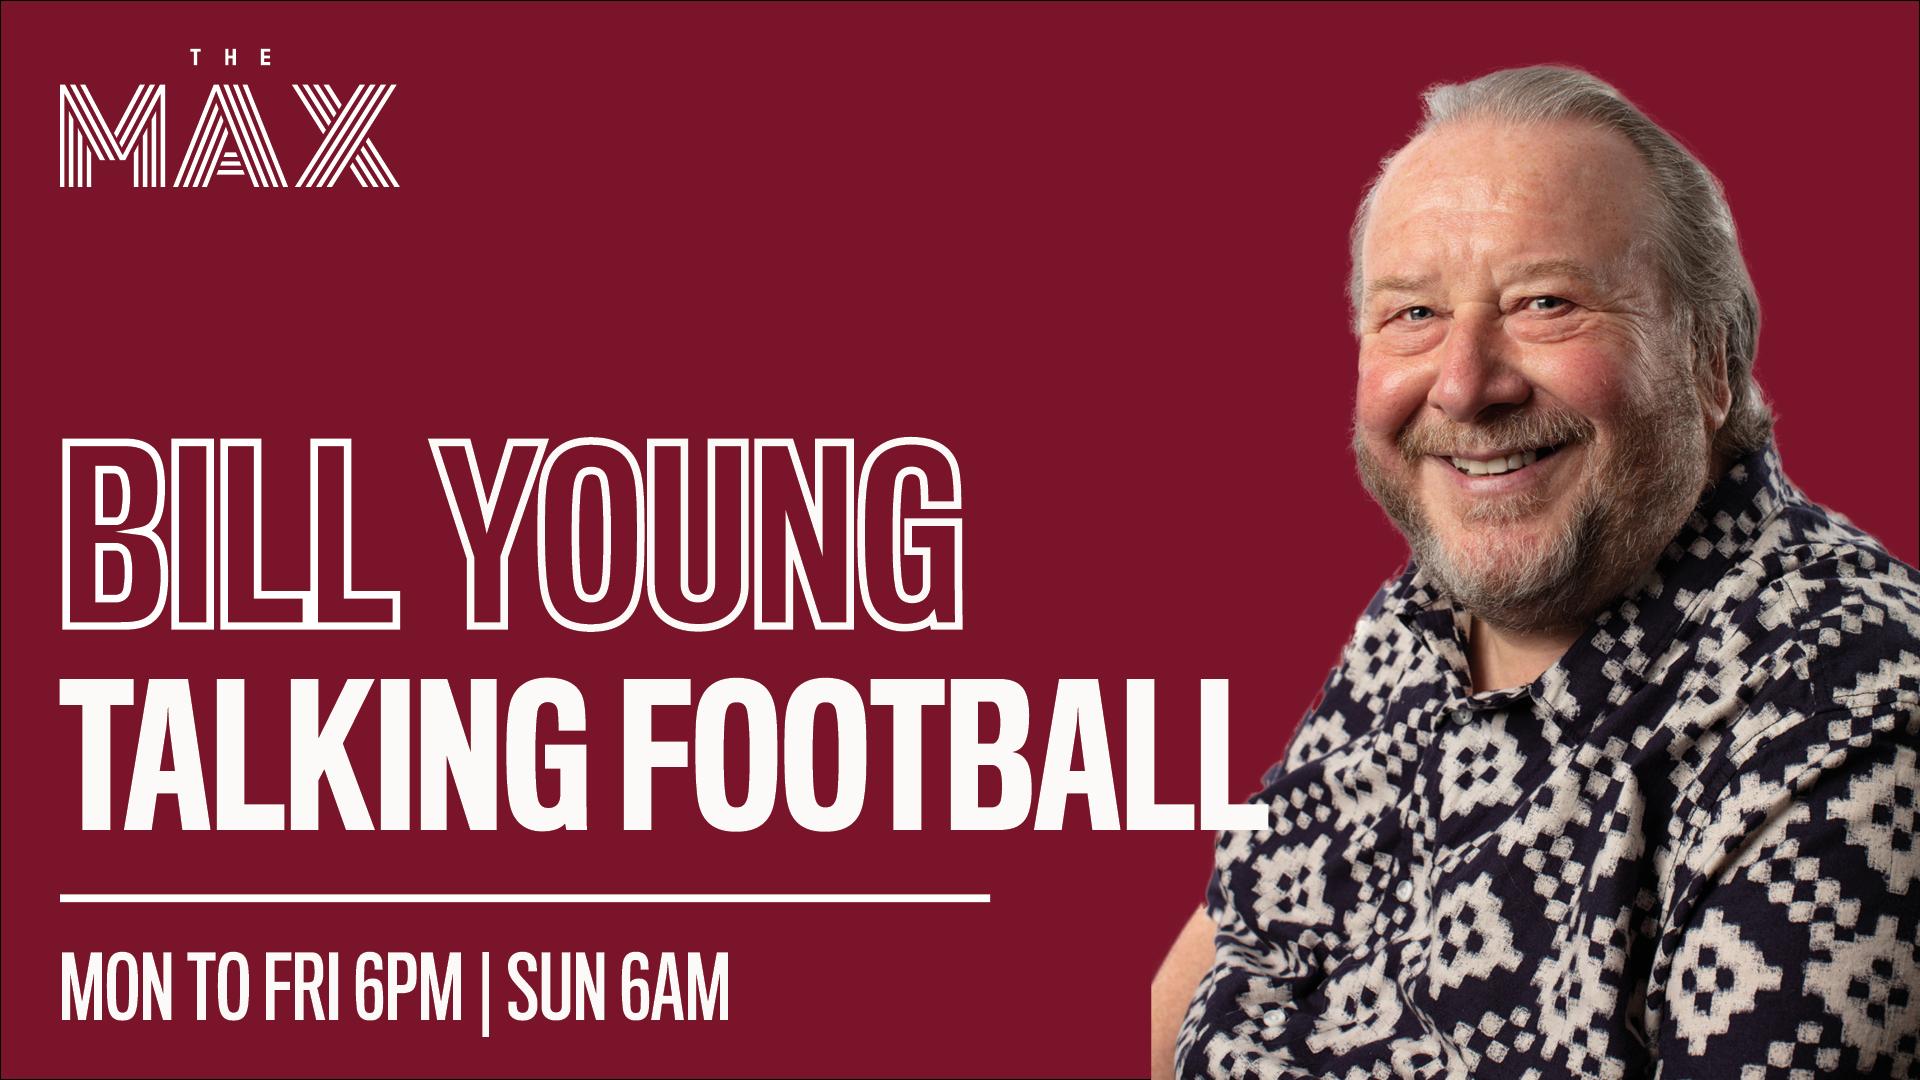 Talking Football with Bill Young - Friday 14th May